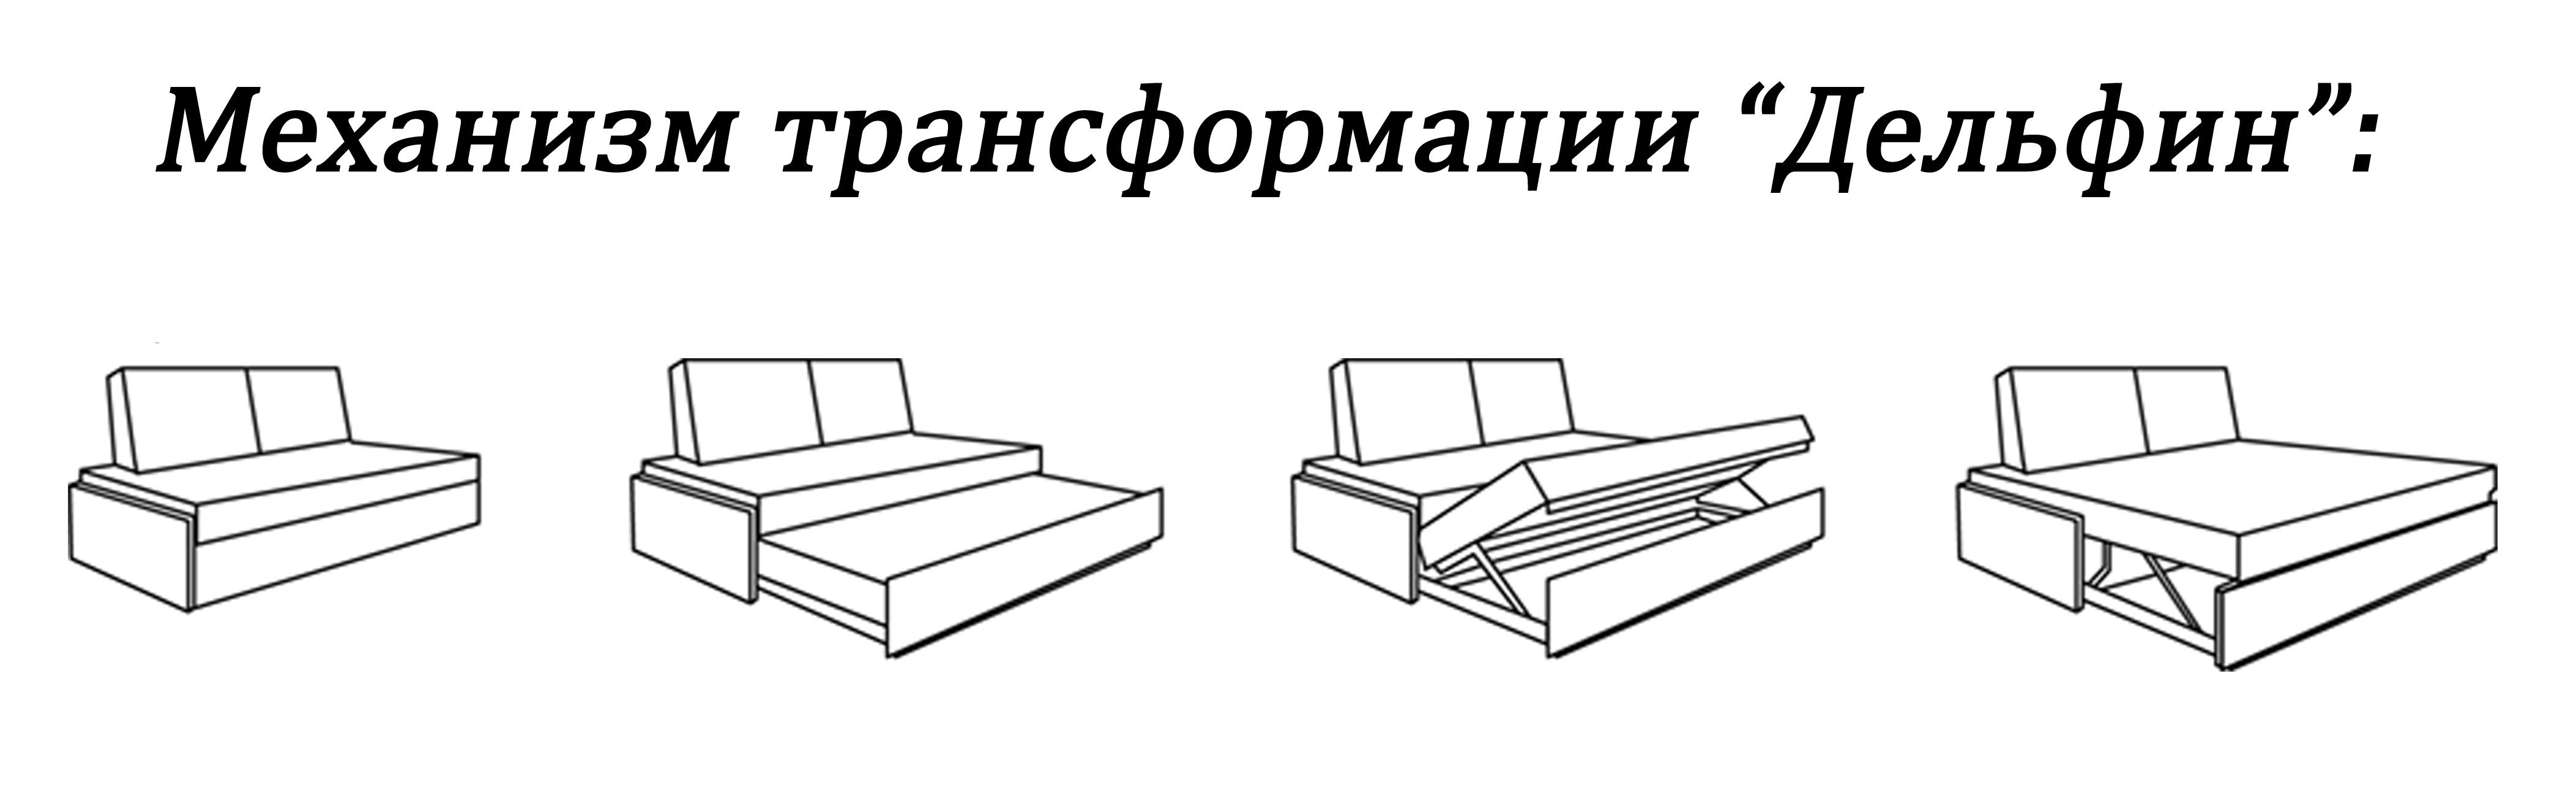 "Схема механизма ""Дельфин"" дивана"